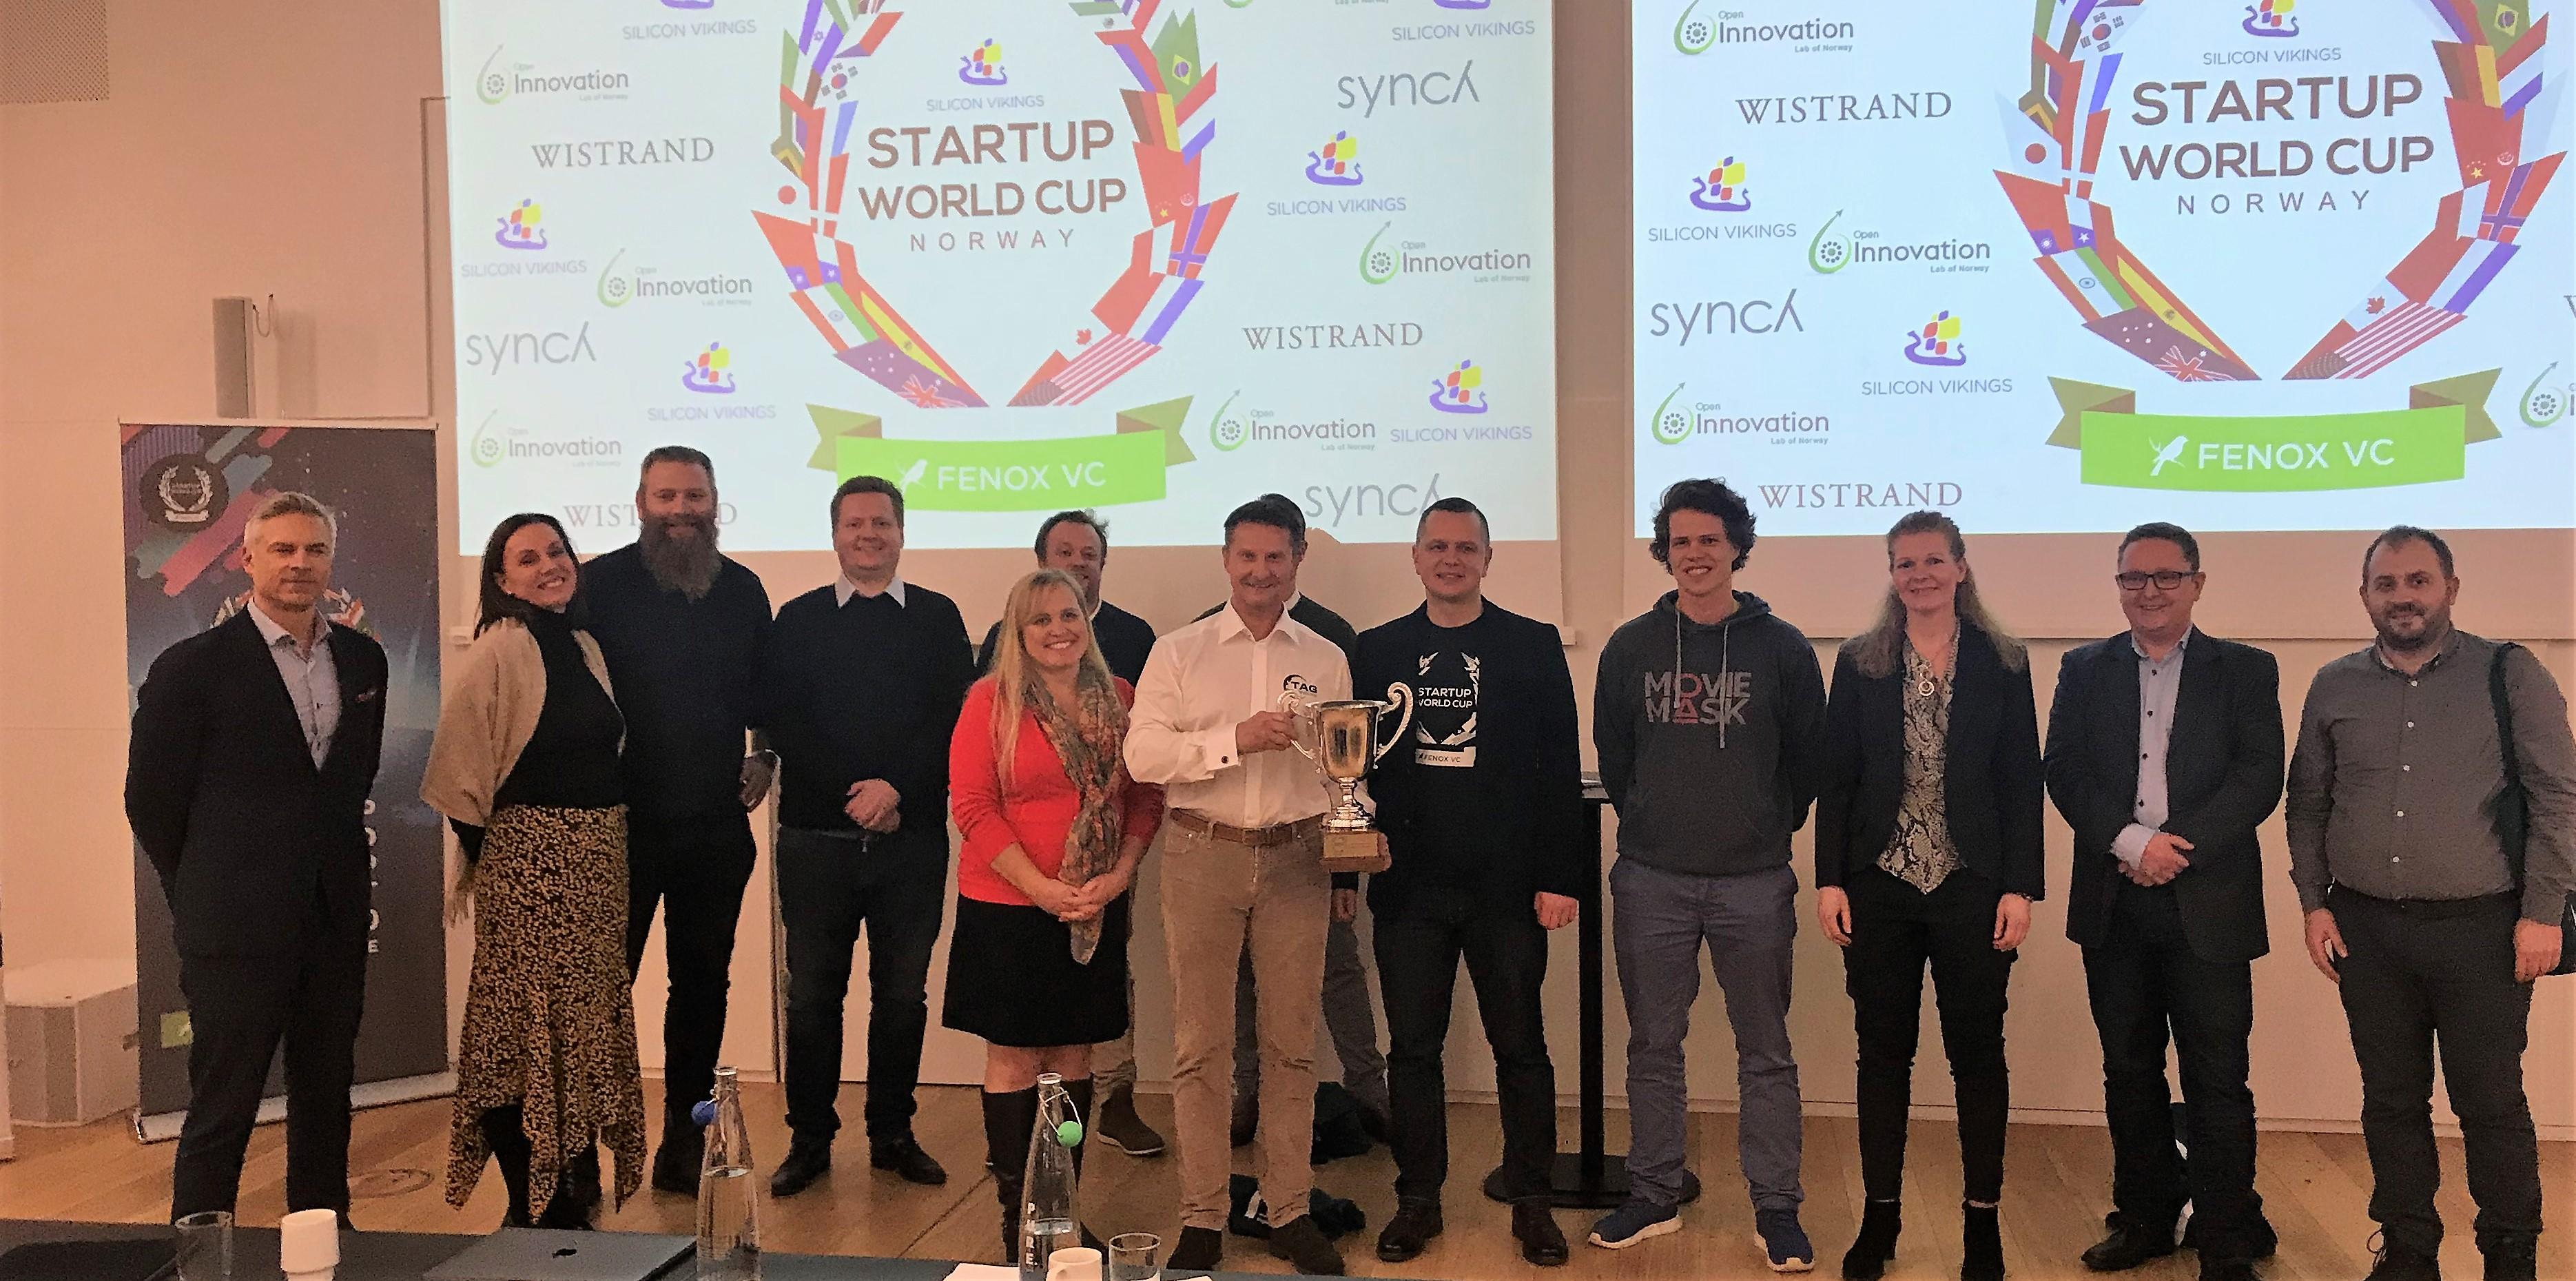 Nordnorsk startup til topps